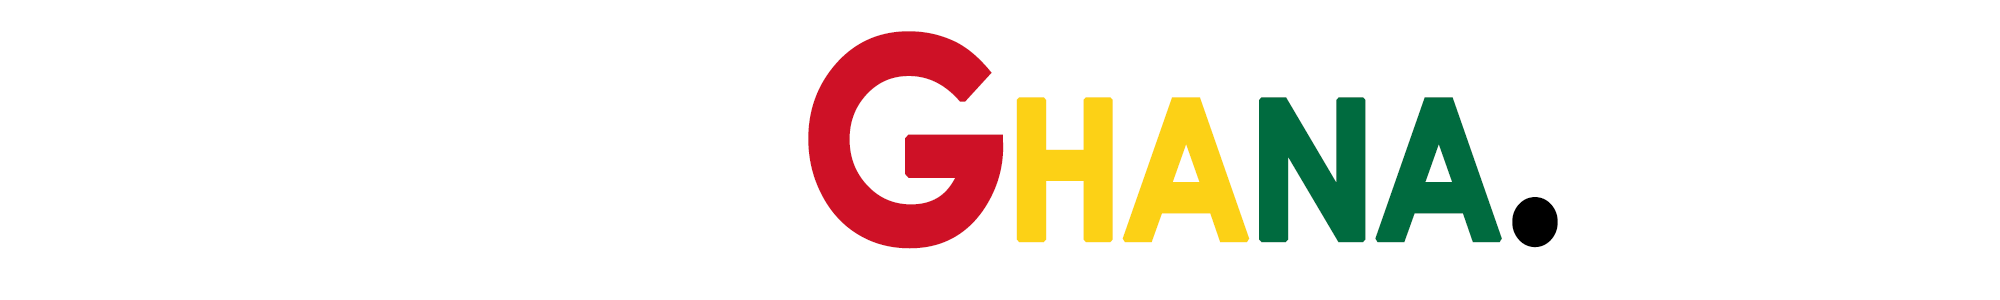 Come to Ghana